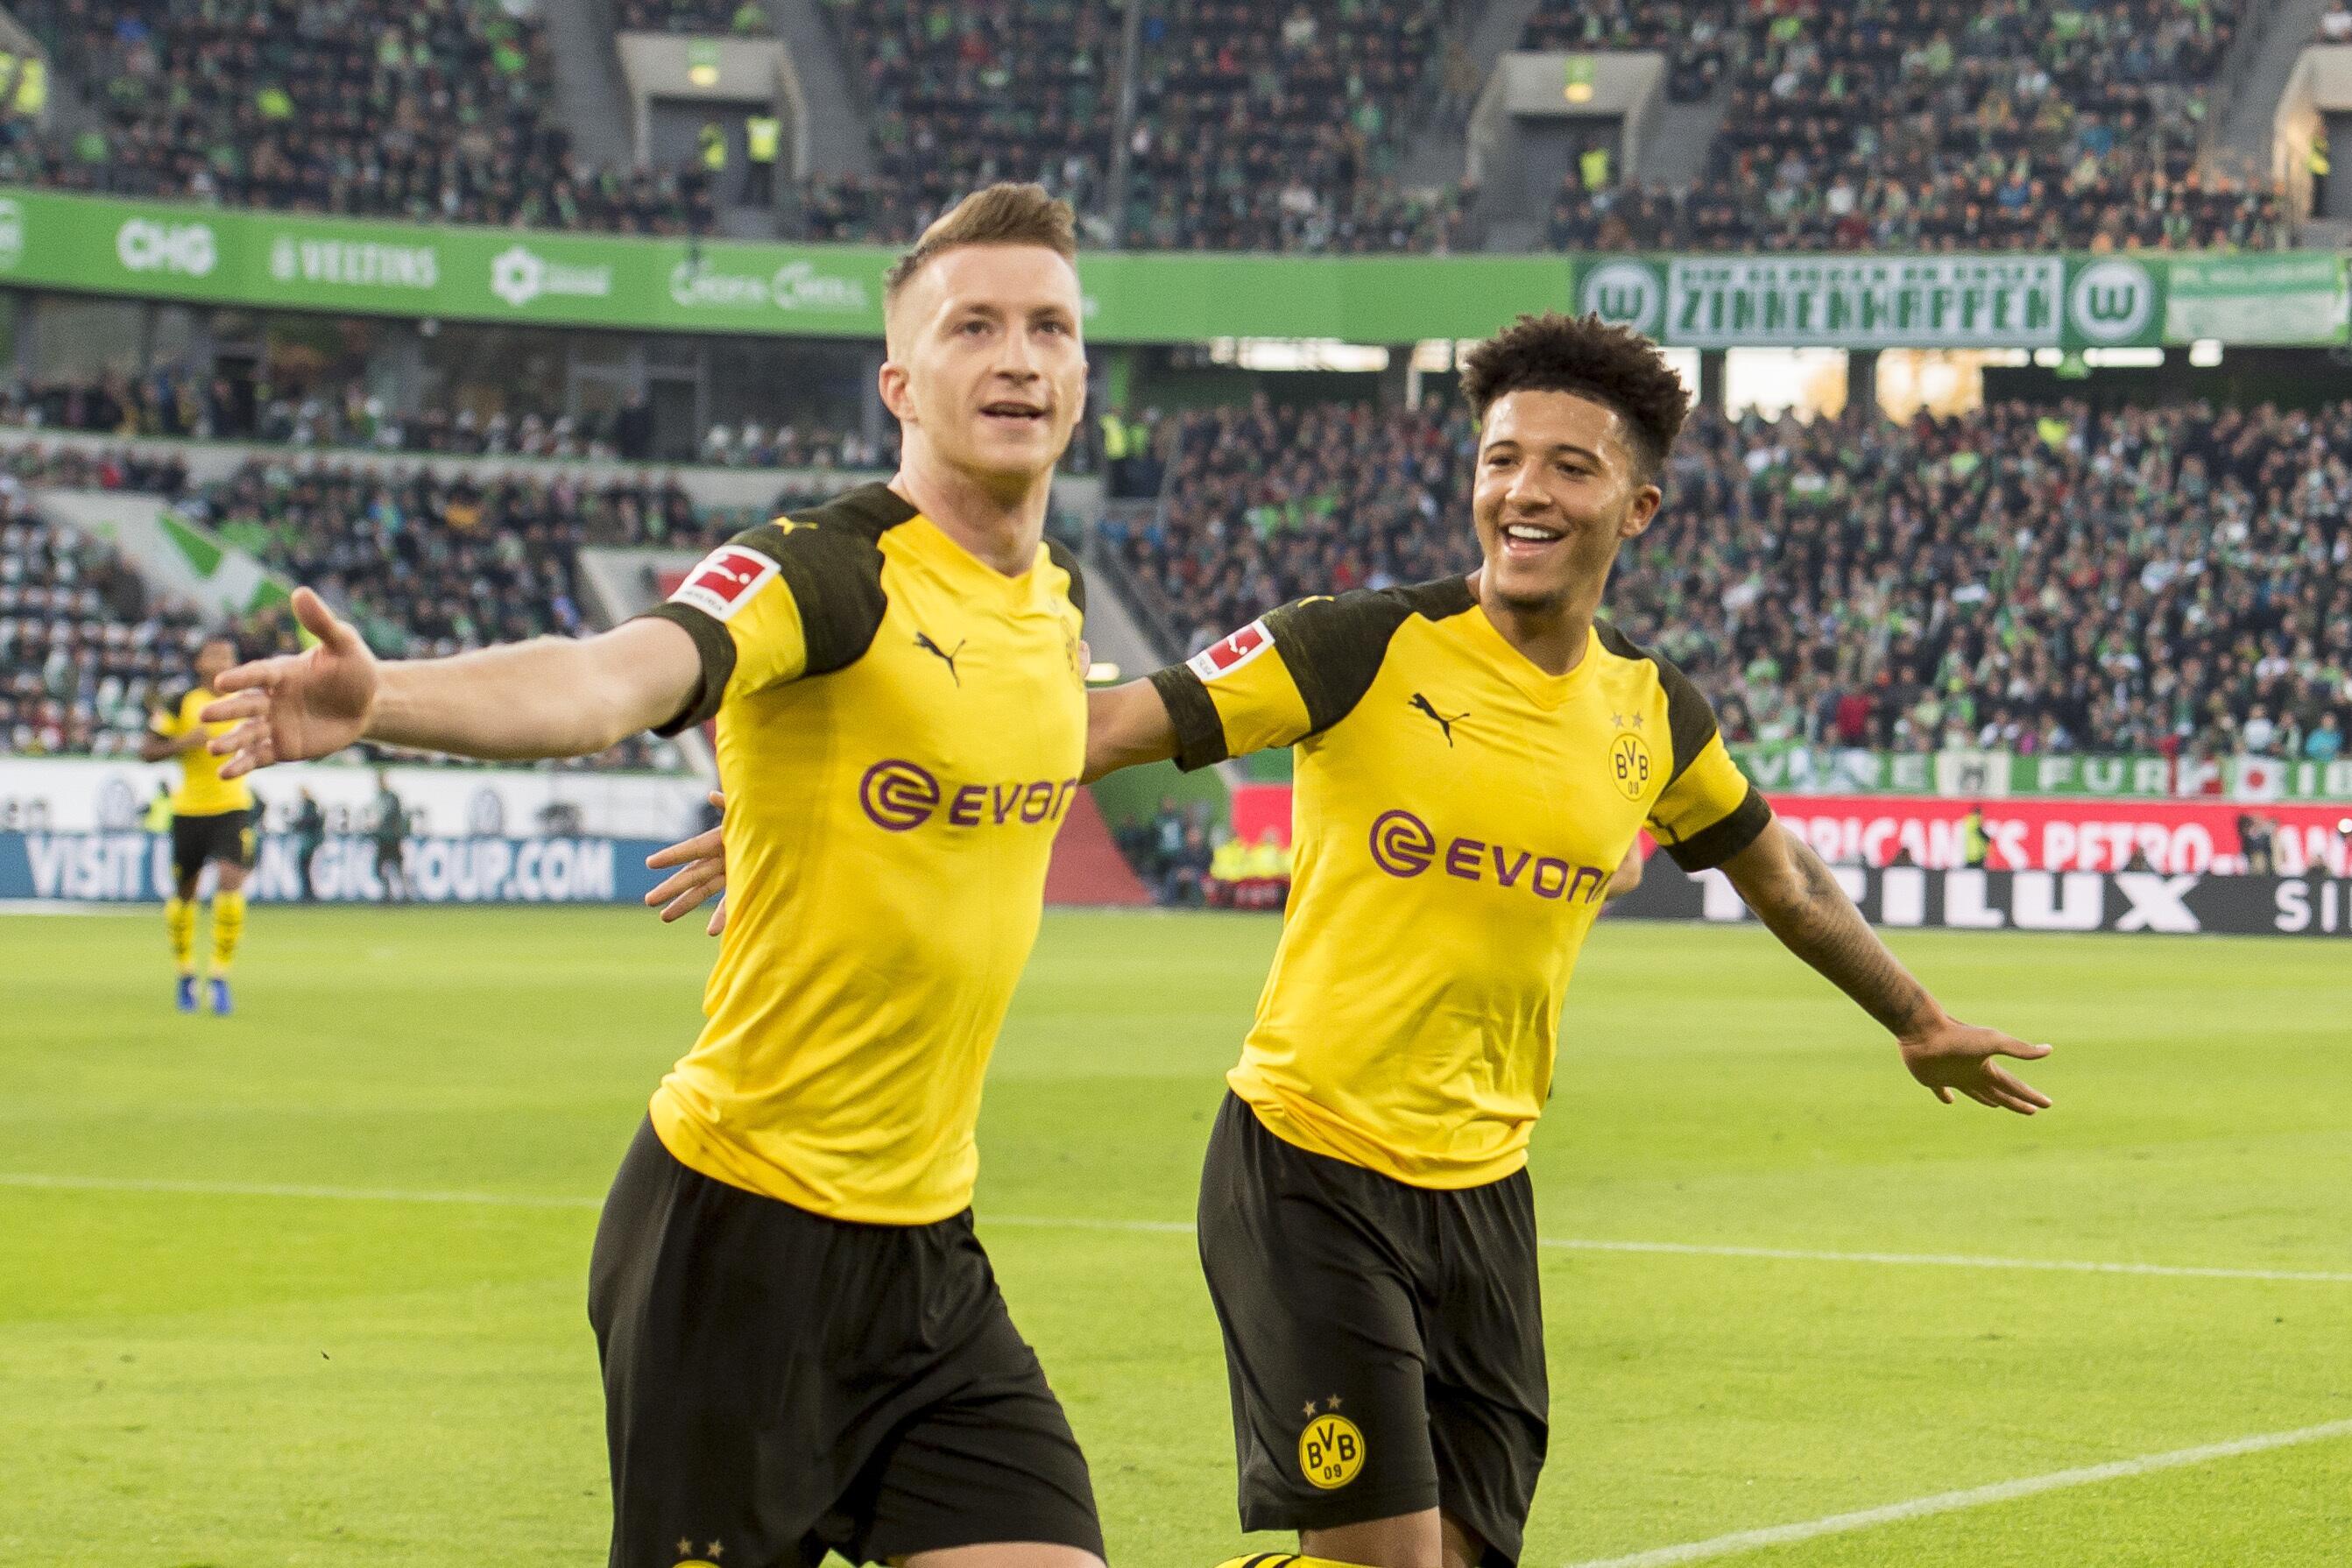 Bild zu Reus, Sancho, Dortmund, BVB, Bundesliga, Fußball